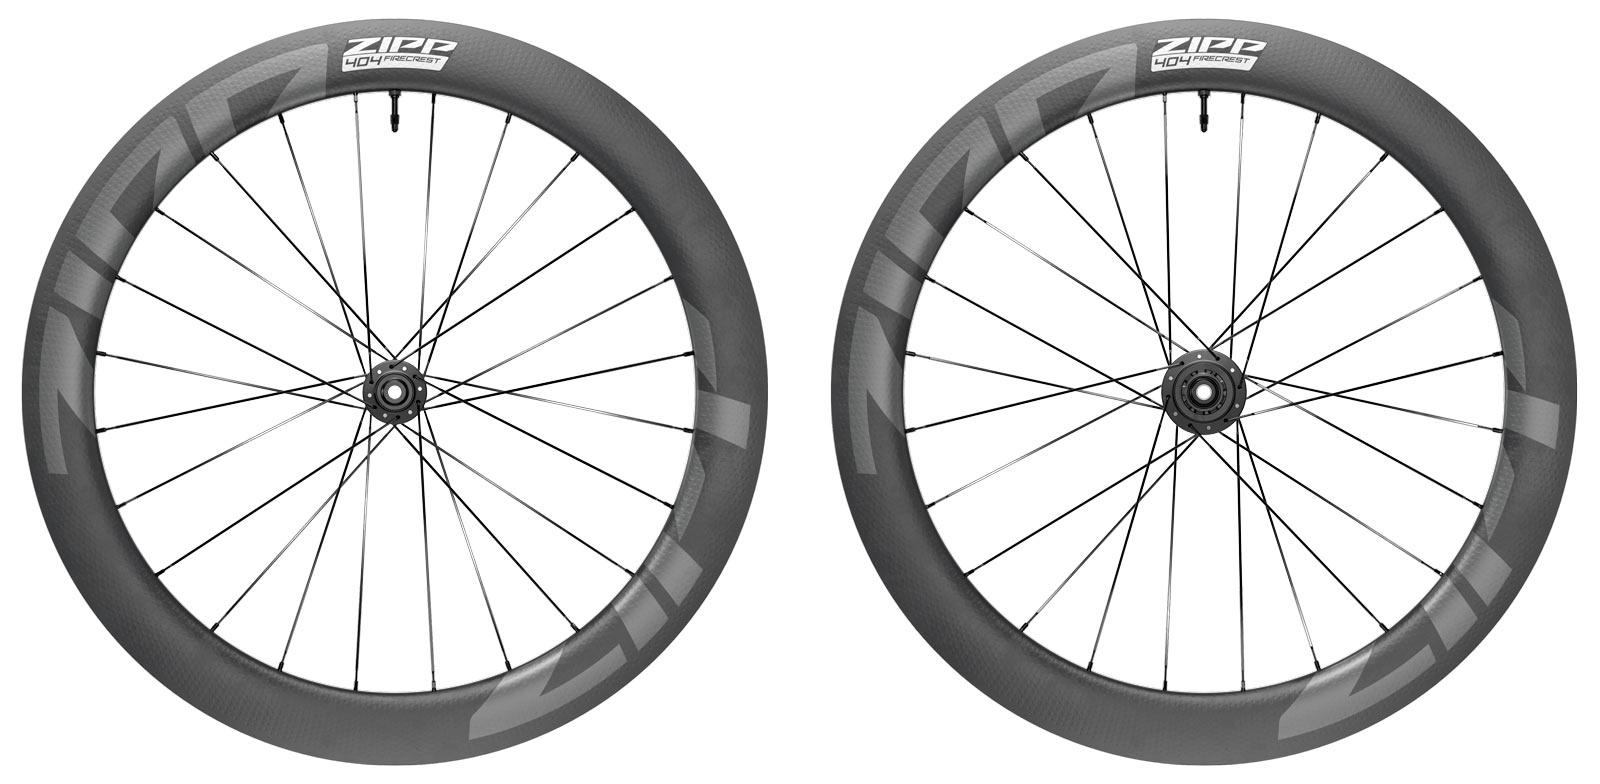 2022 zipp 404 firecrest tubeless ready disc brake road bike wheels